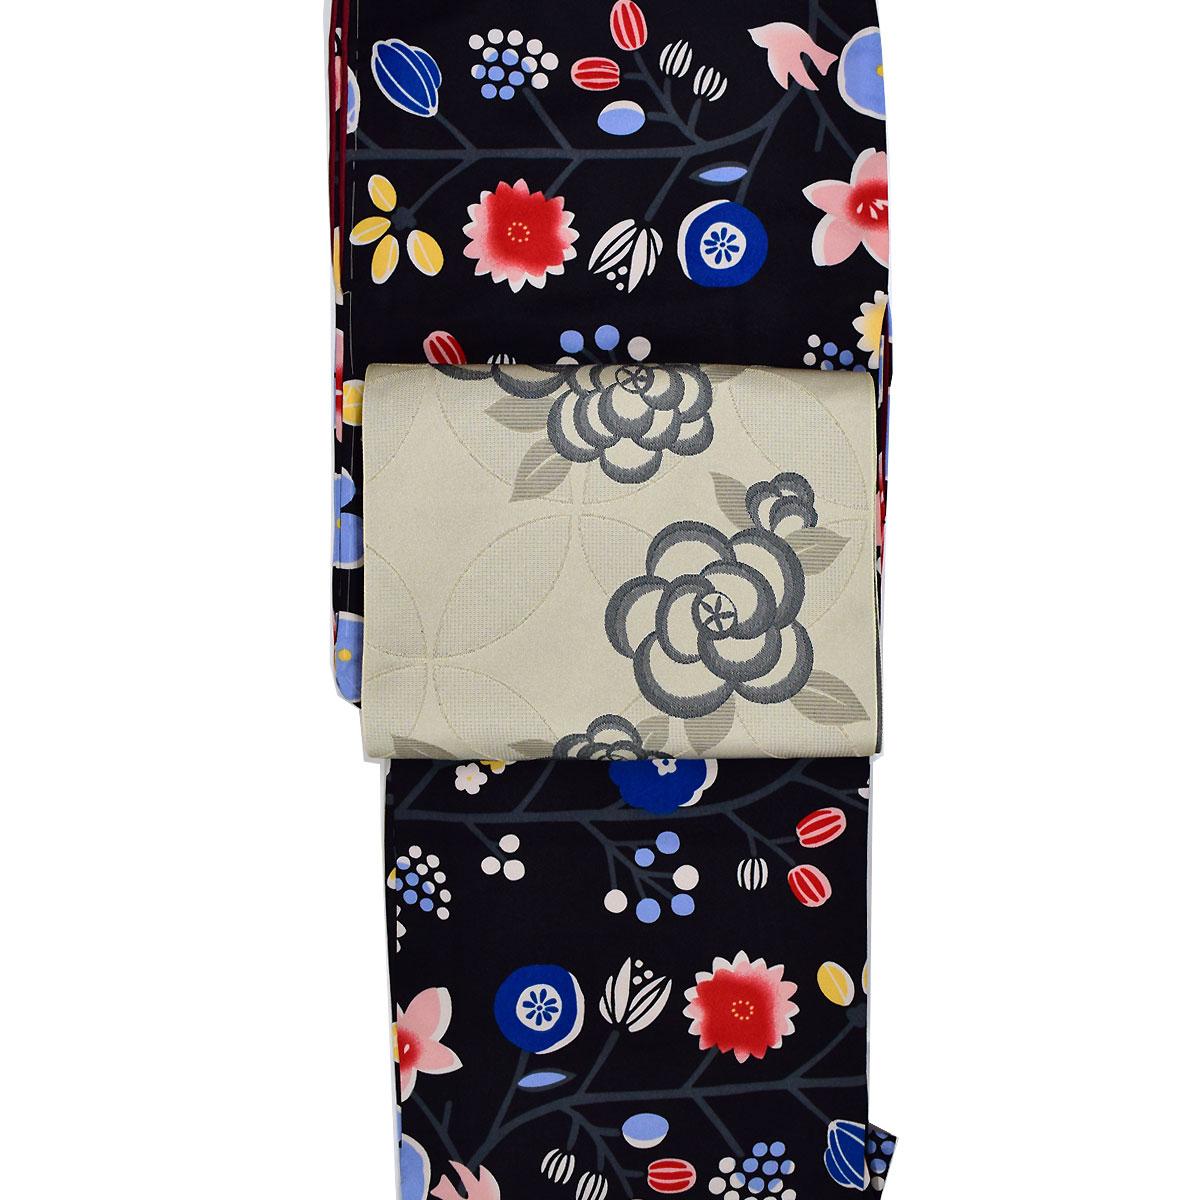 【M寸】【 袷 】 洗える着物 セット【花ひめ】 洗える着物 + 洗える 八寸 名古屋帯 【org-obi】番号d808-9